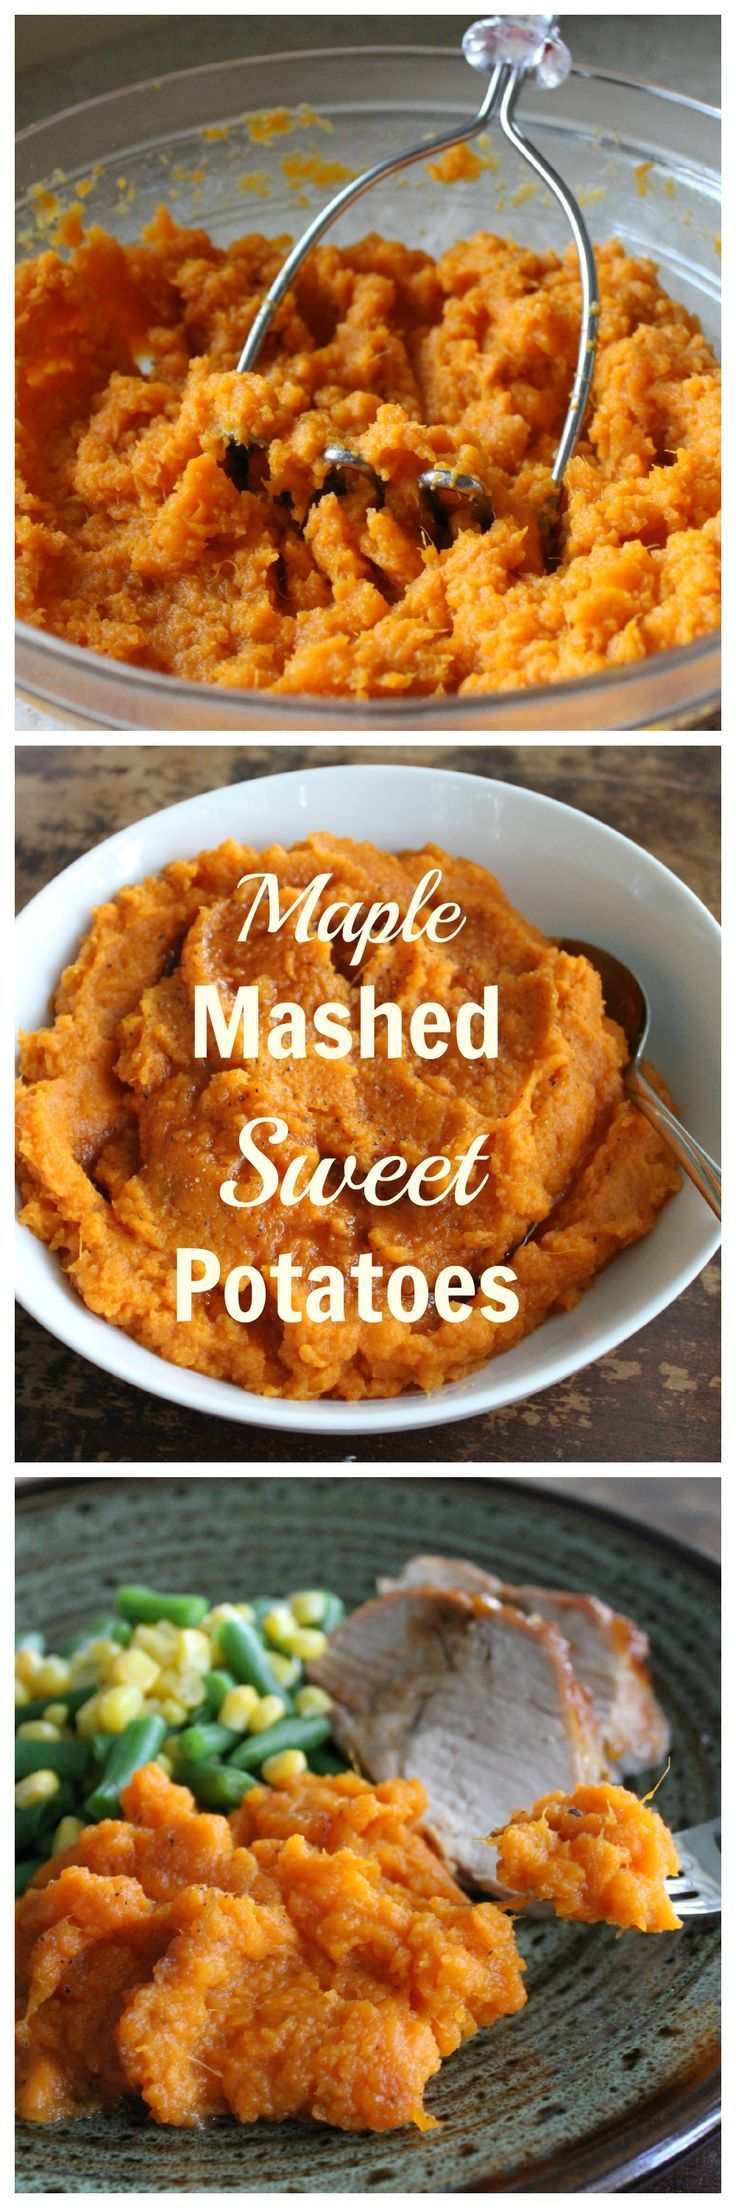 How Long To Bake Mashed Sweet Potatoes